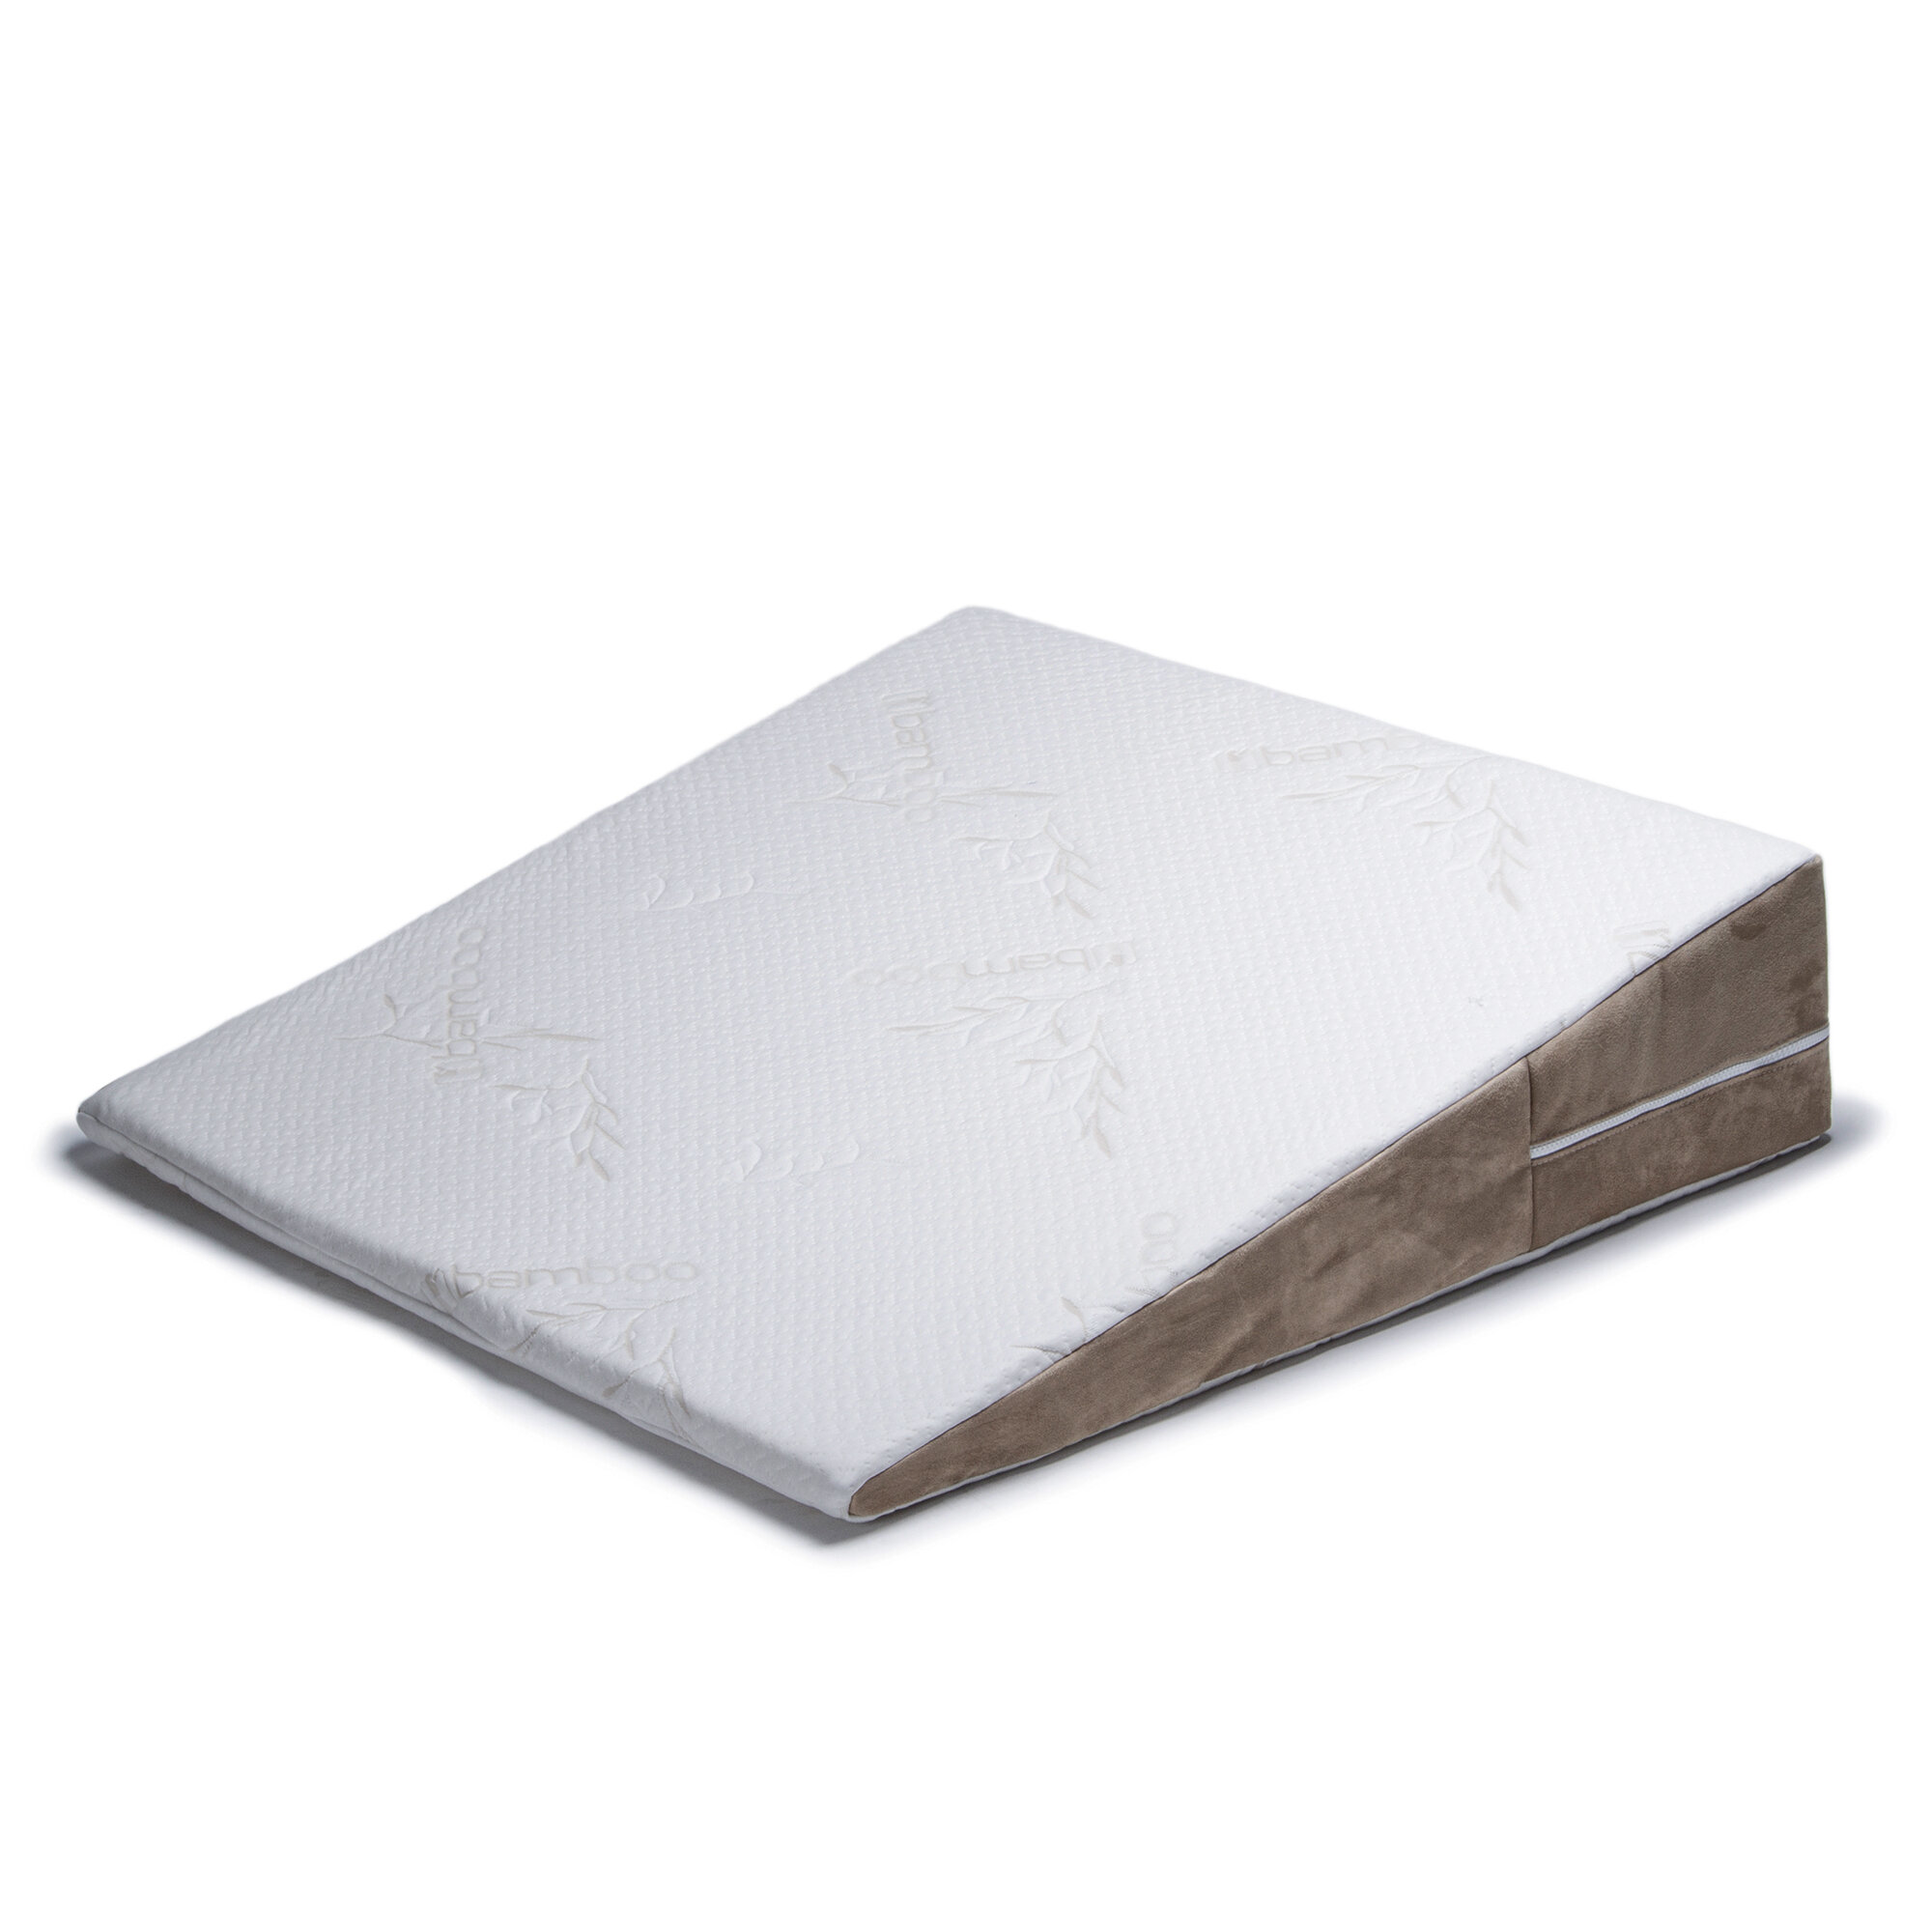 Bed Wedge: Jaxx Avana Bed Wedge Memory Foam Pillow